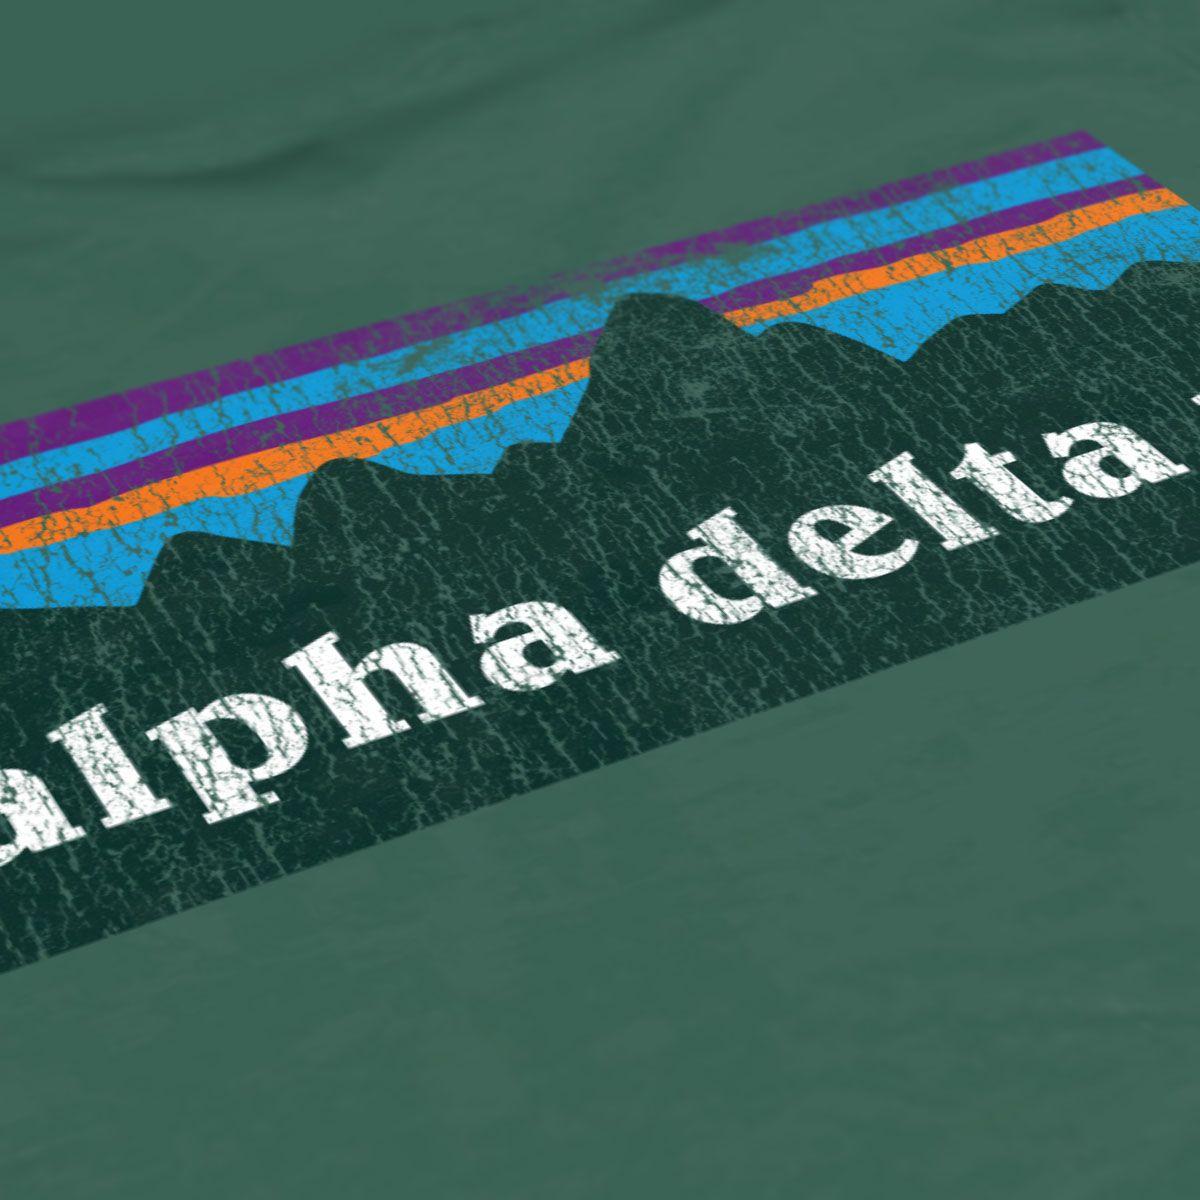 T shirt design jonesboro ar - Alpha Delta Pi Adpi Patagonia Design Arkansas Adpi Sorority T Shirts